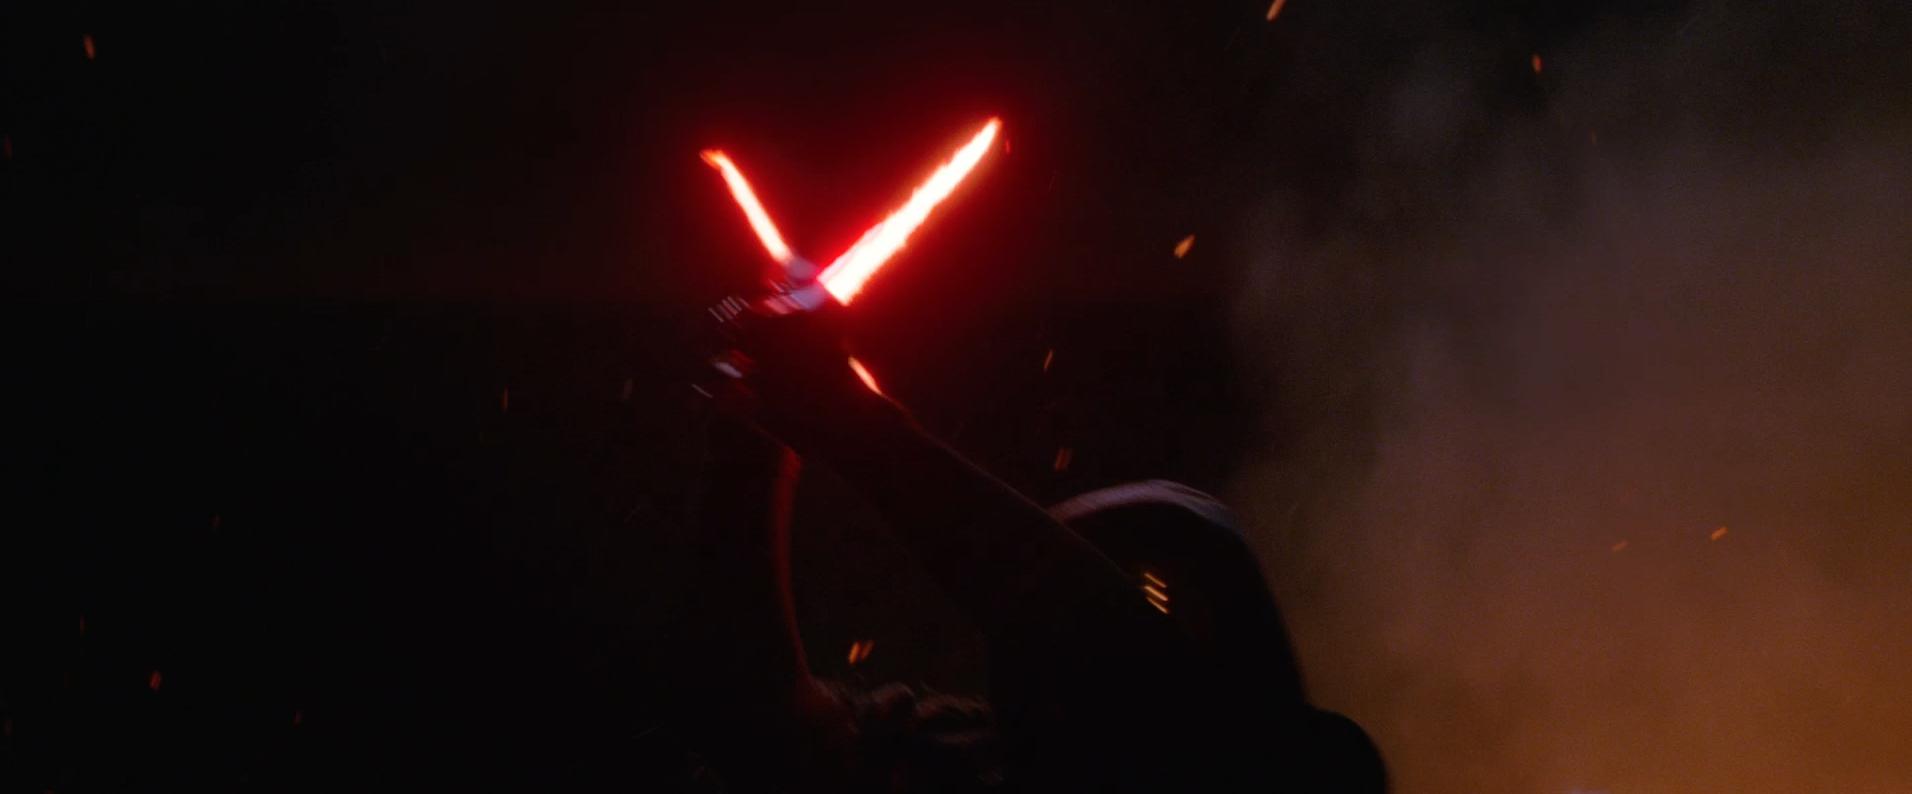 the-force-awakens-kylo-ren-swinging